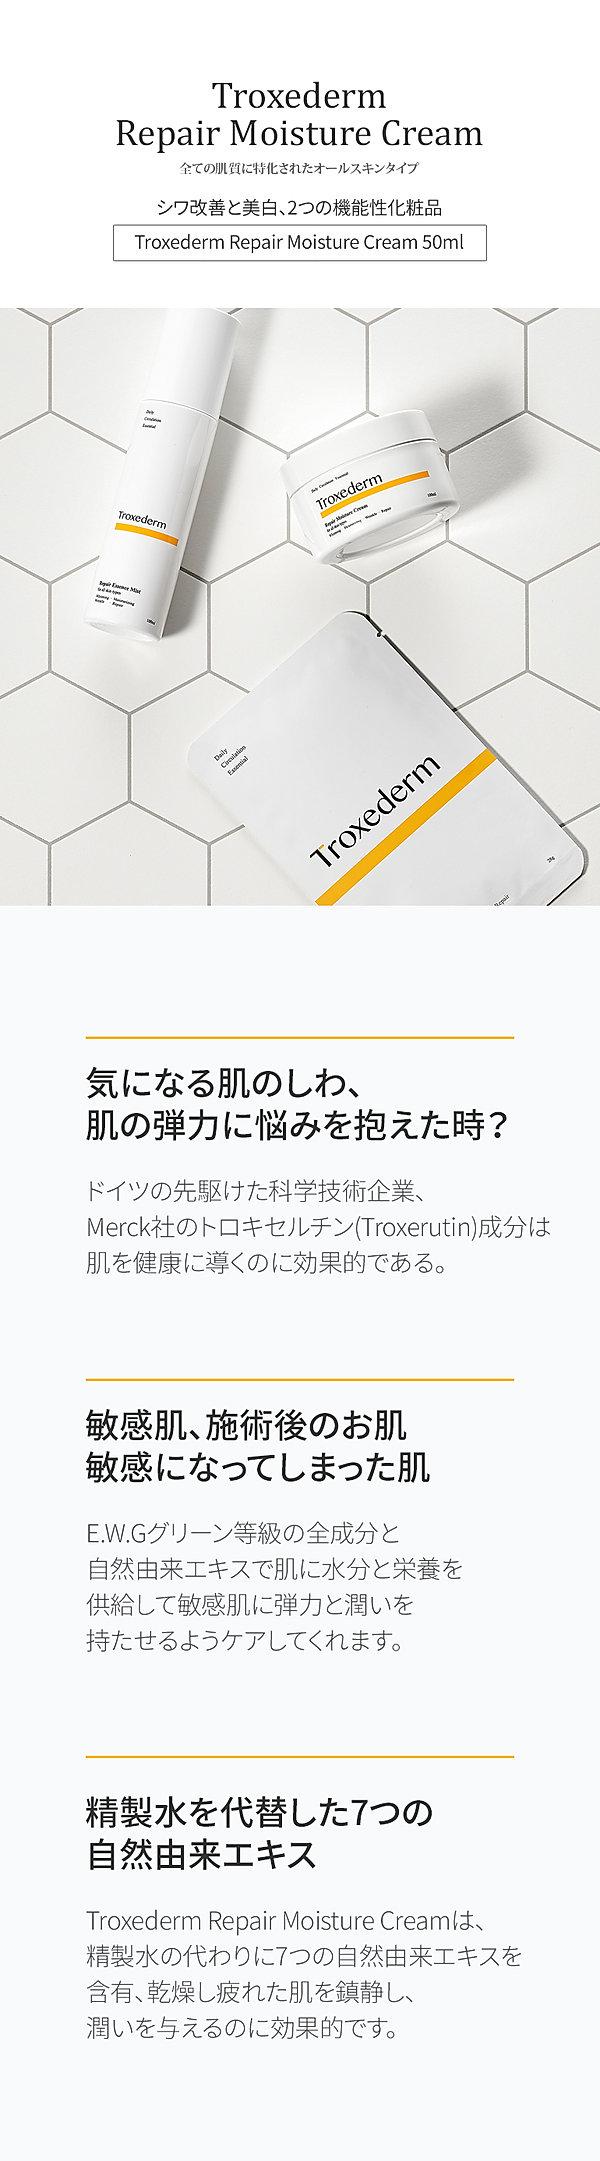 0602_cream_page_모바일-상세페이지_일본어_01.jpg